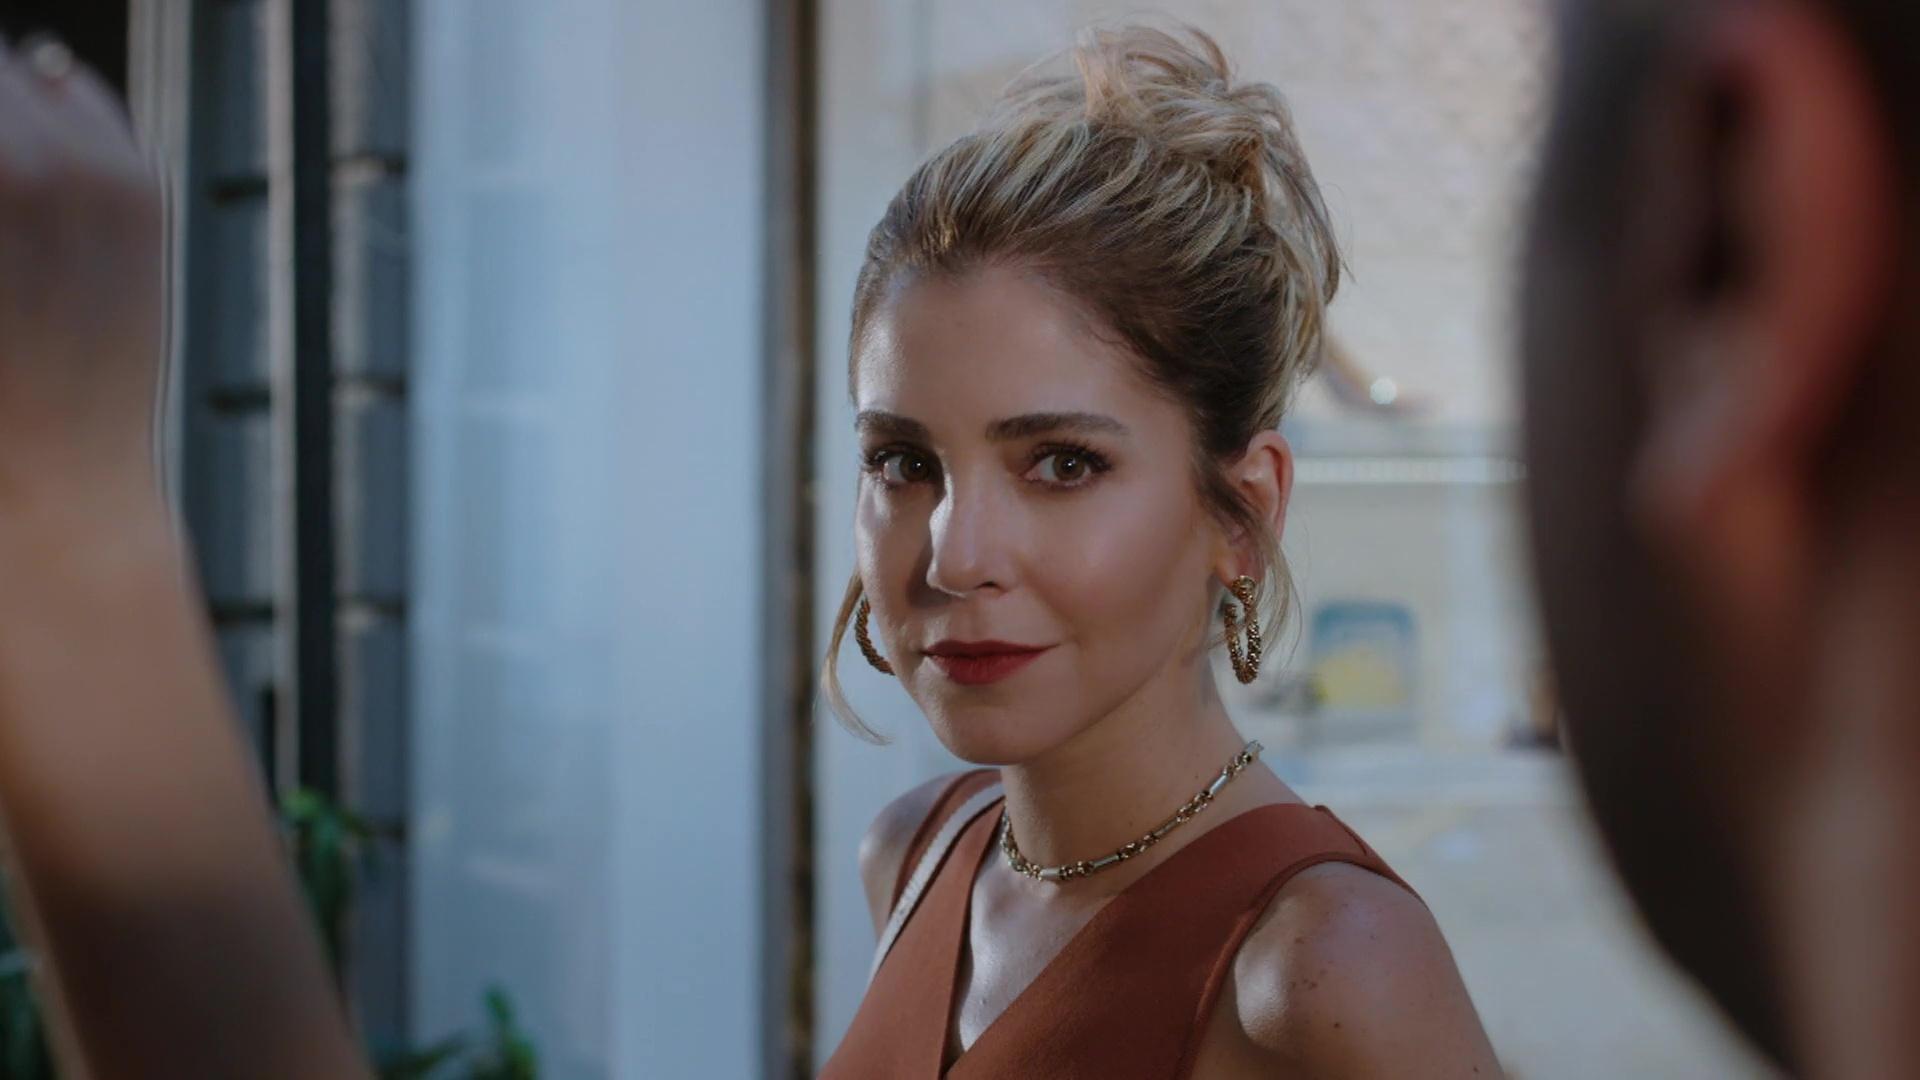 Sanem Cevher (played by Gokce Eyuboglu) is Azra's hard-headed sister